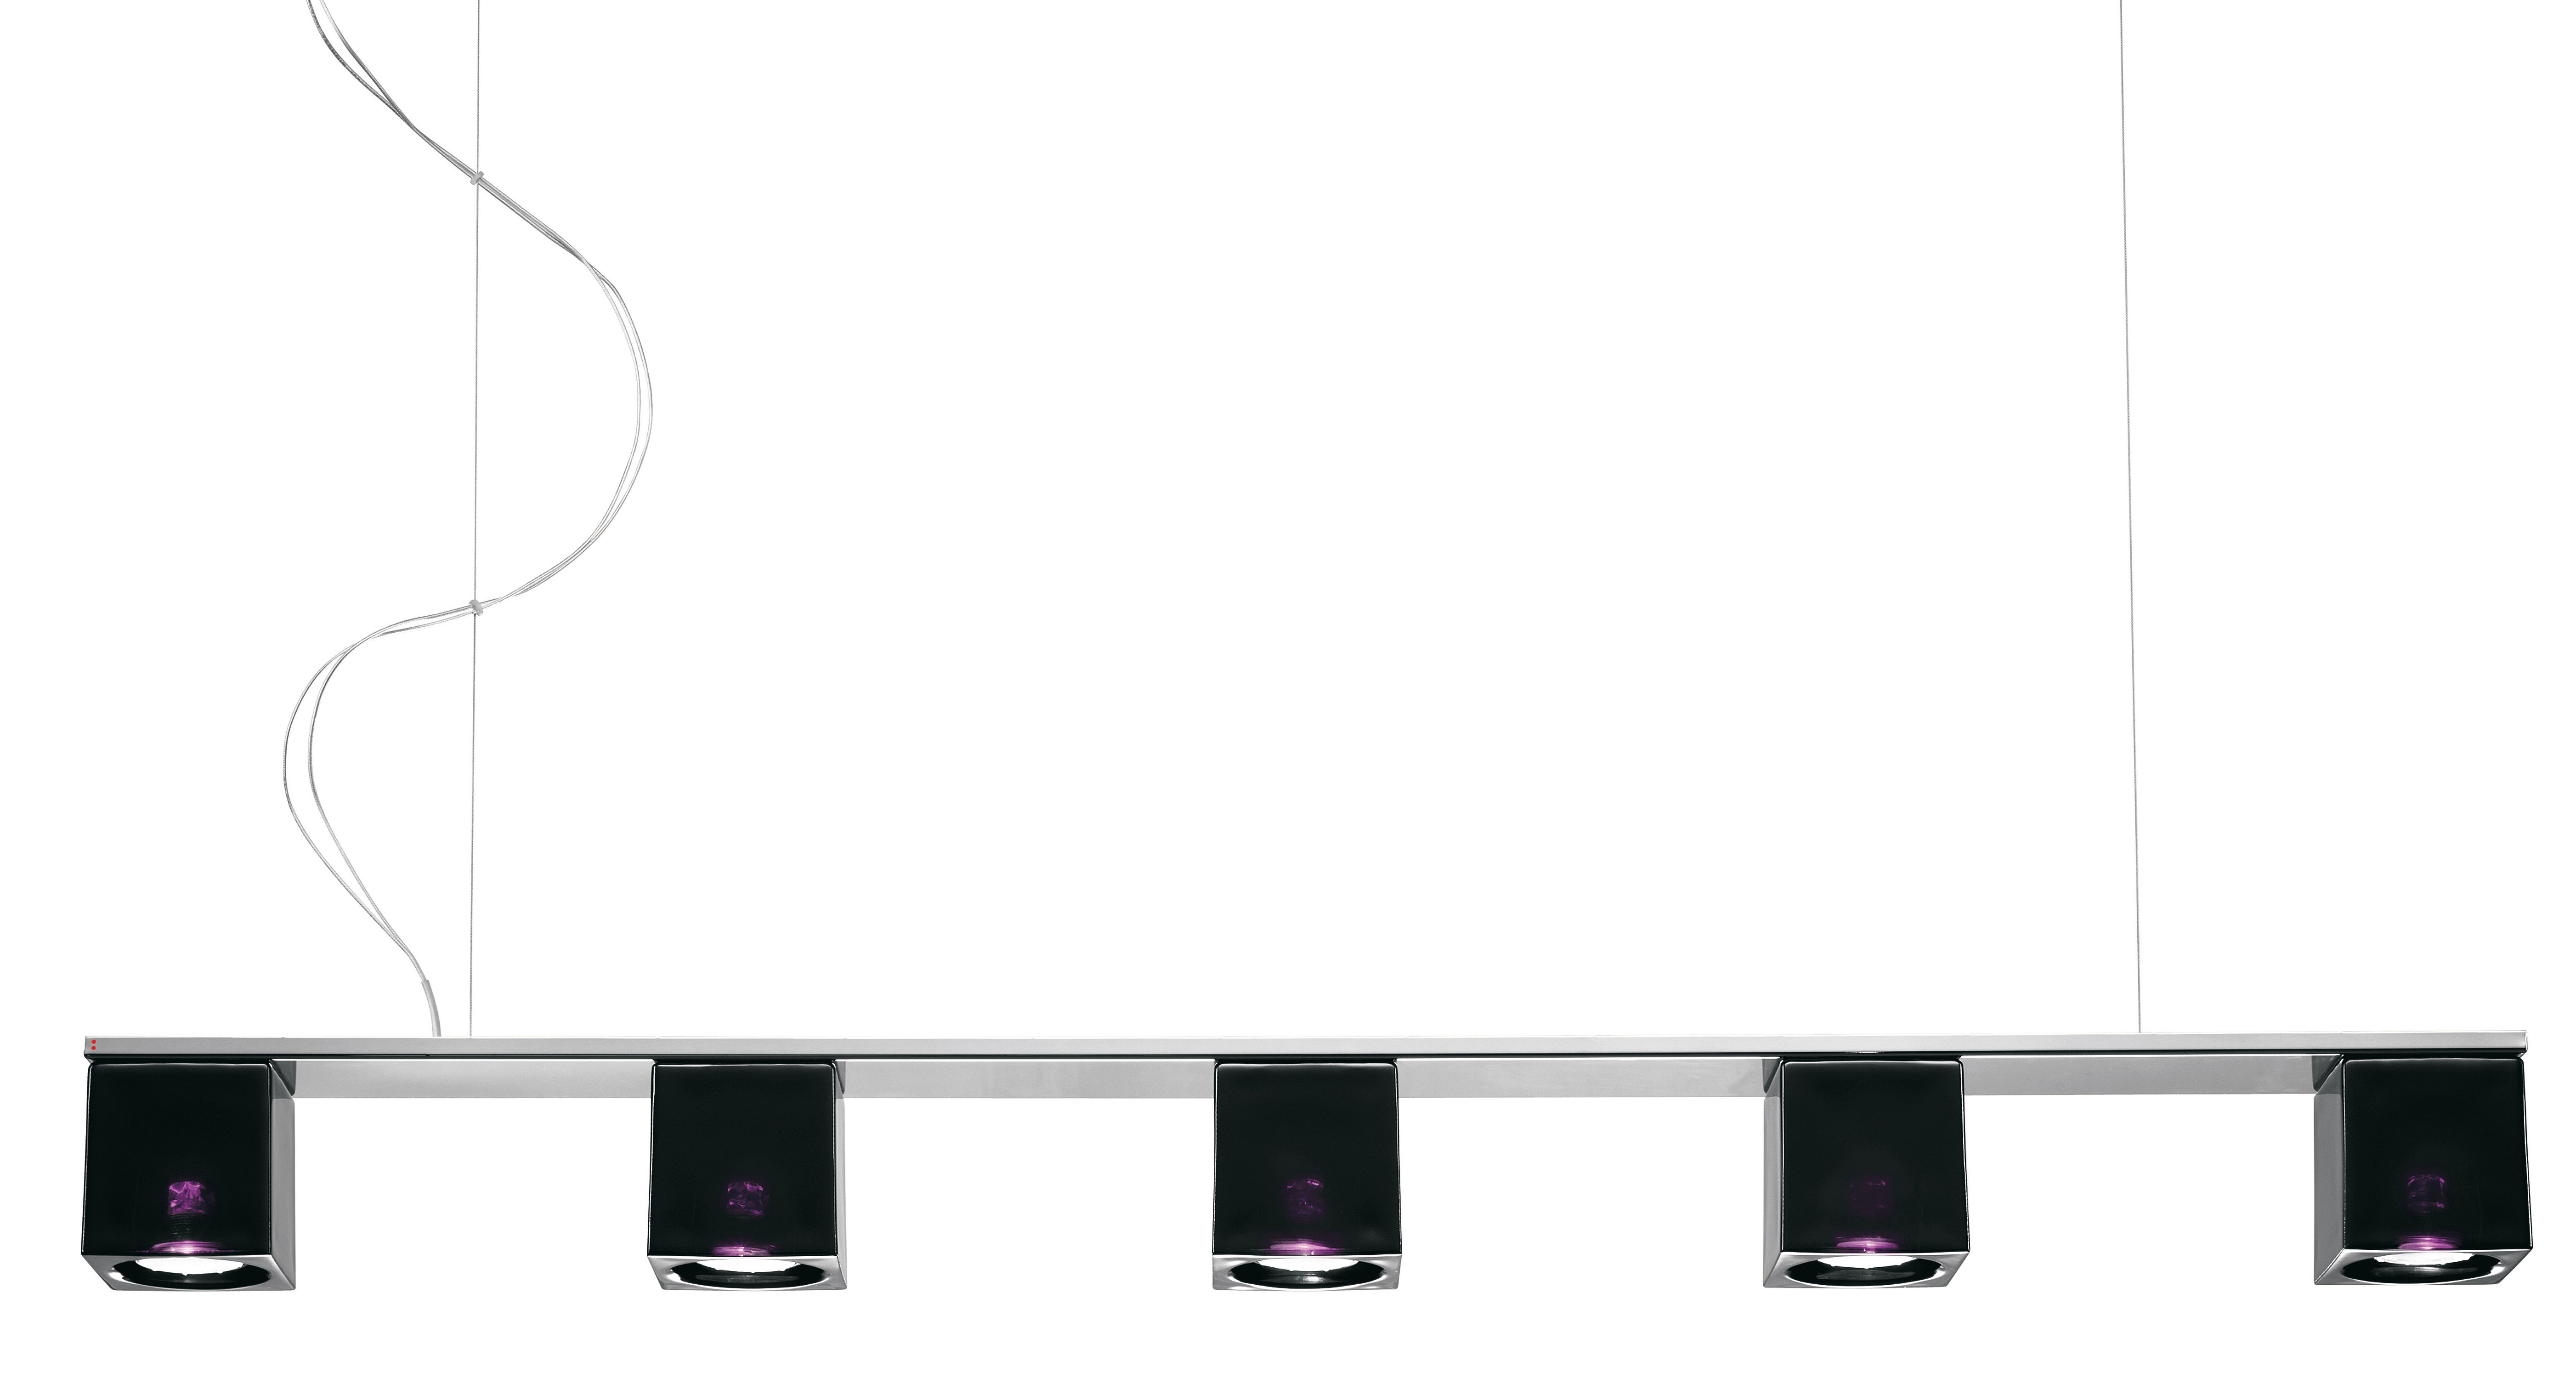 Lighting - Pendant Lighting - Cubetto - Black Glass Pendant - 5 elements by Fabbian - Black - Chromed metal, Glass